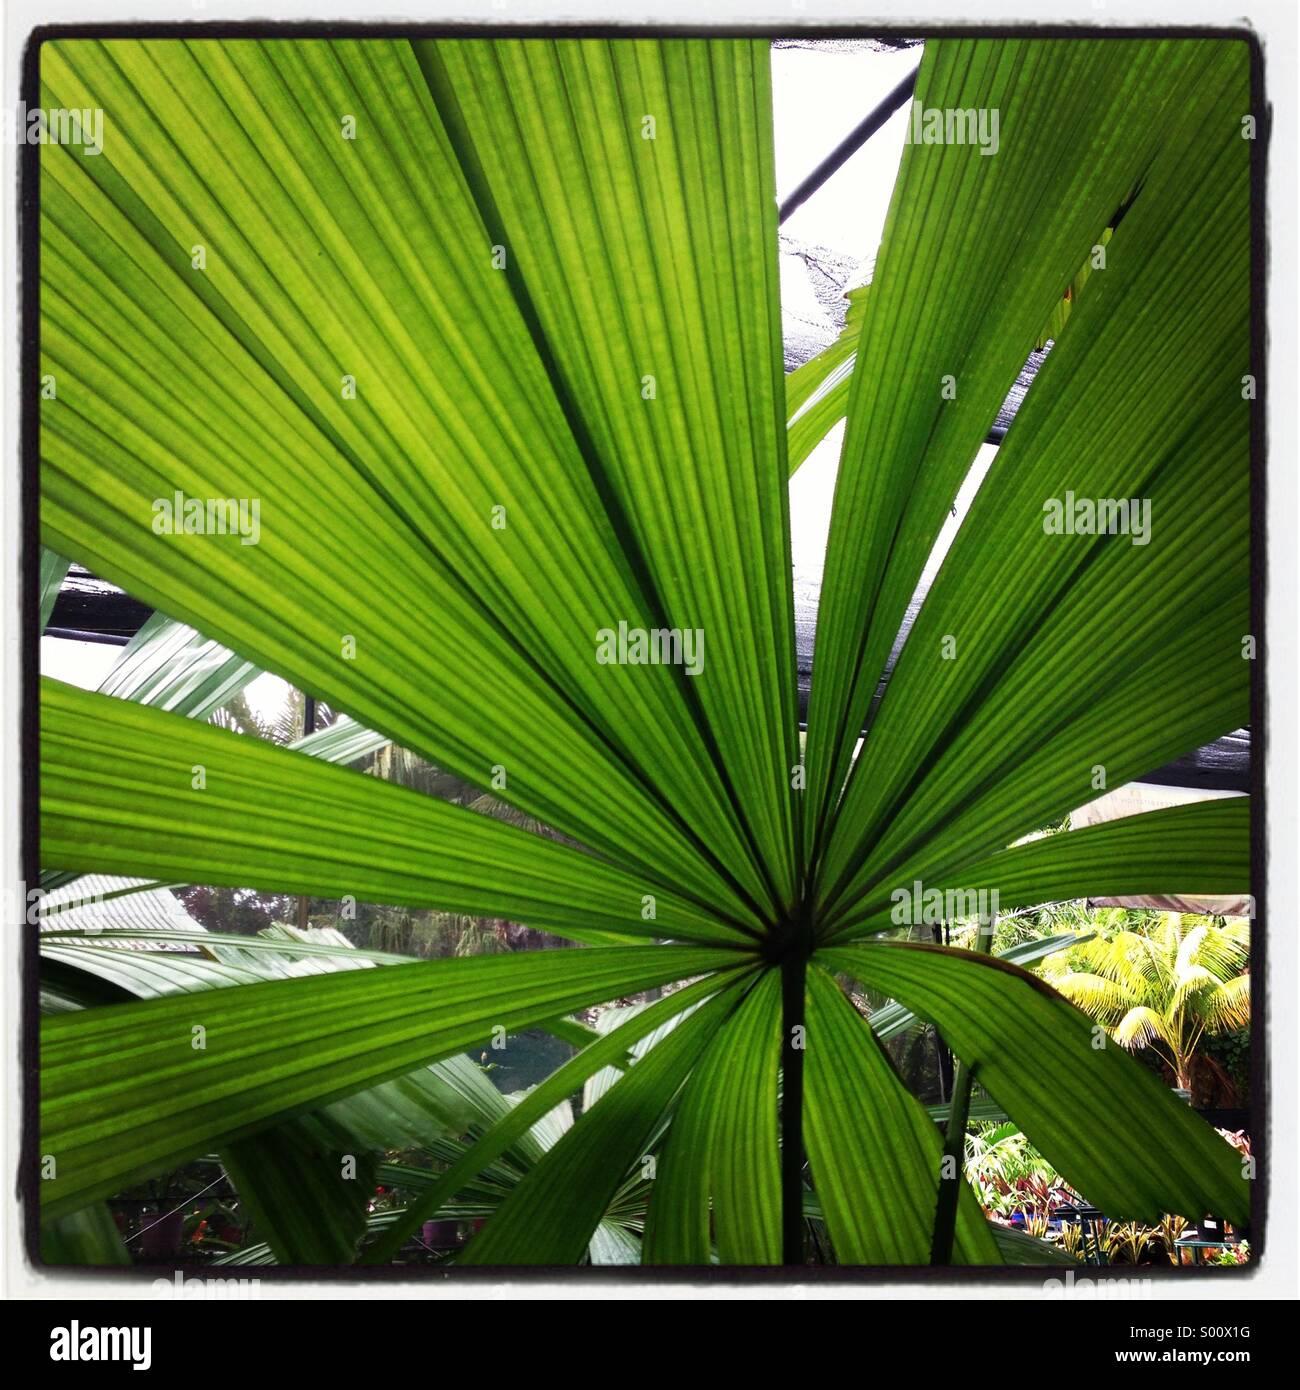 Palmitos Imagen De Stock